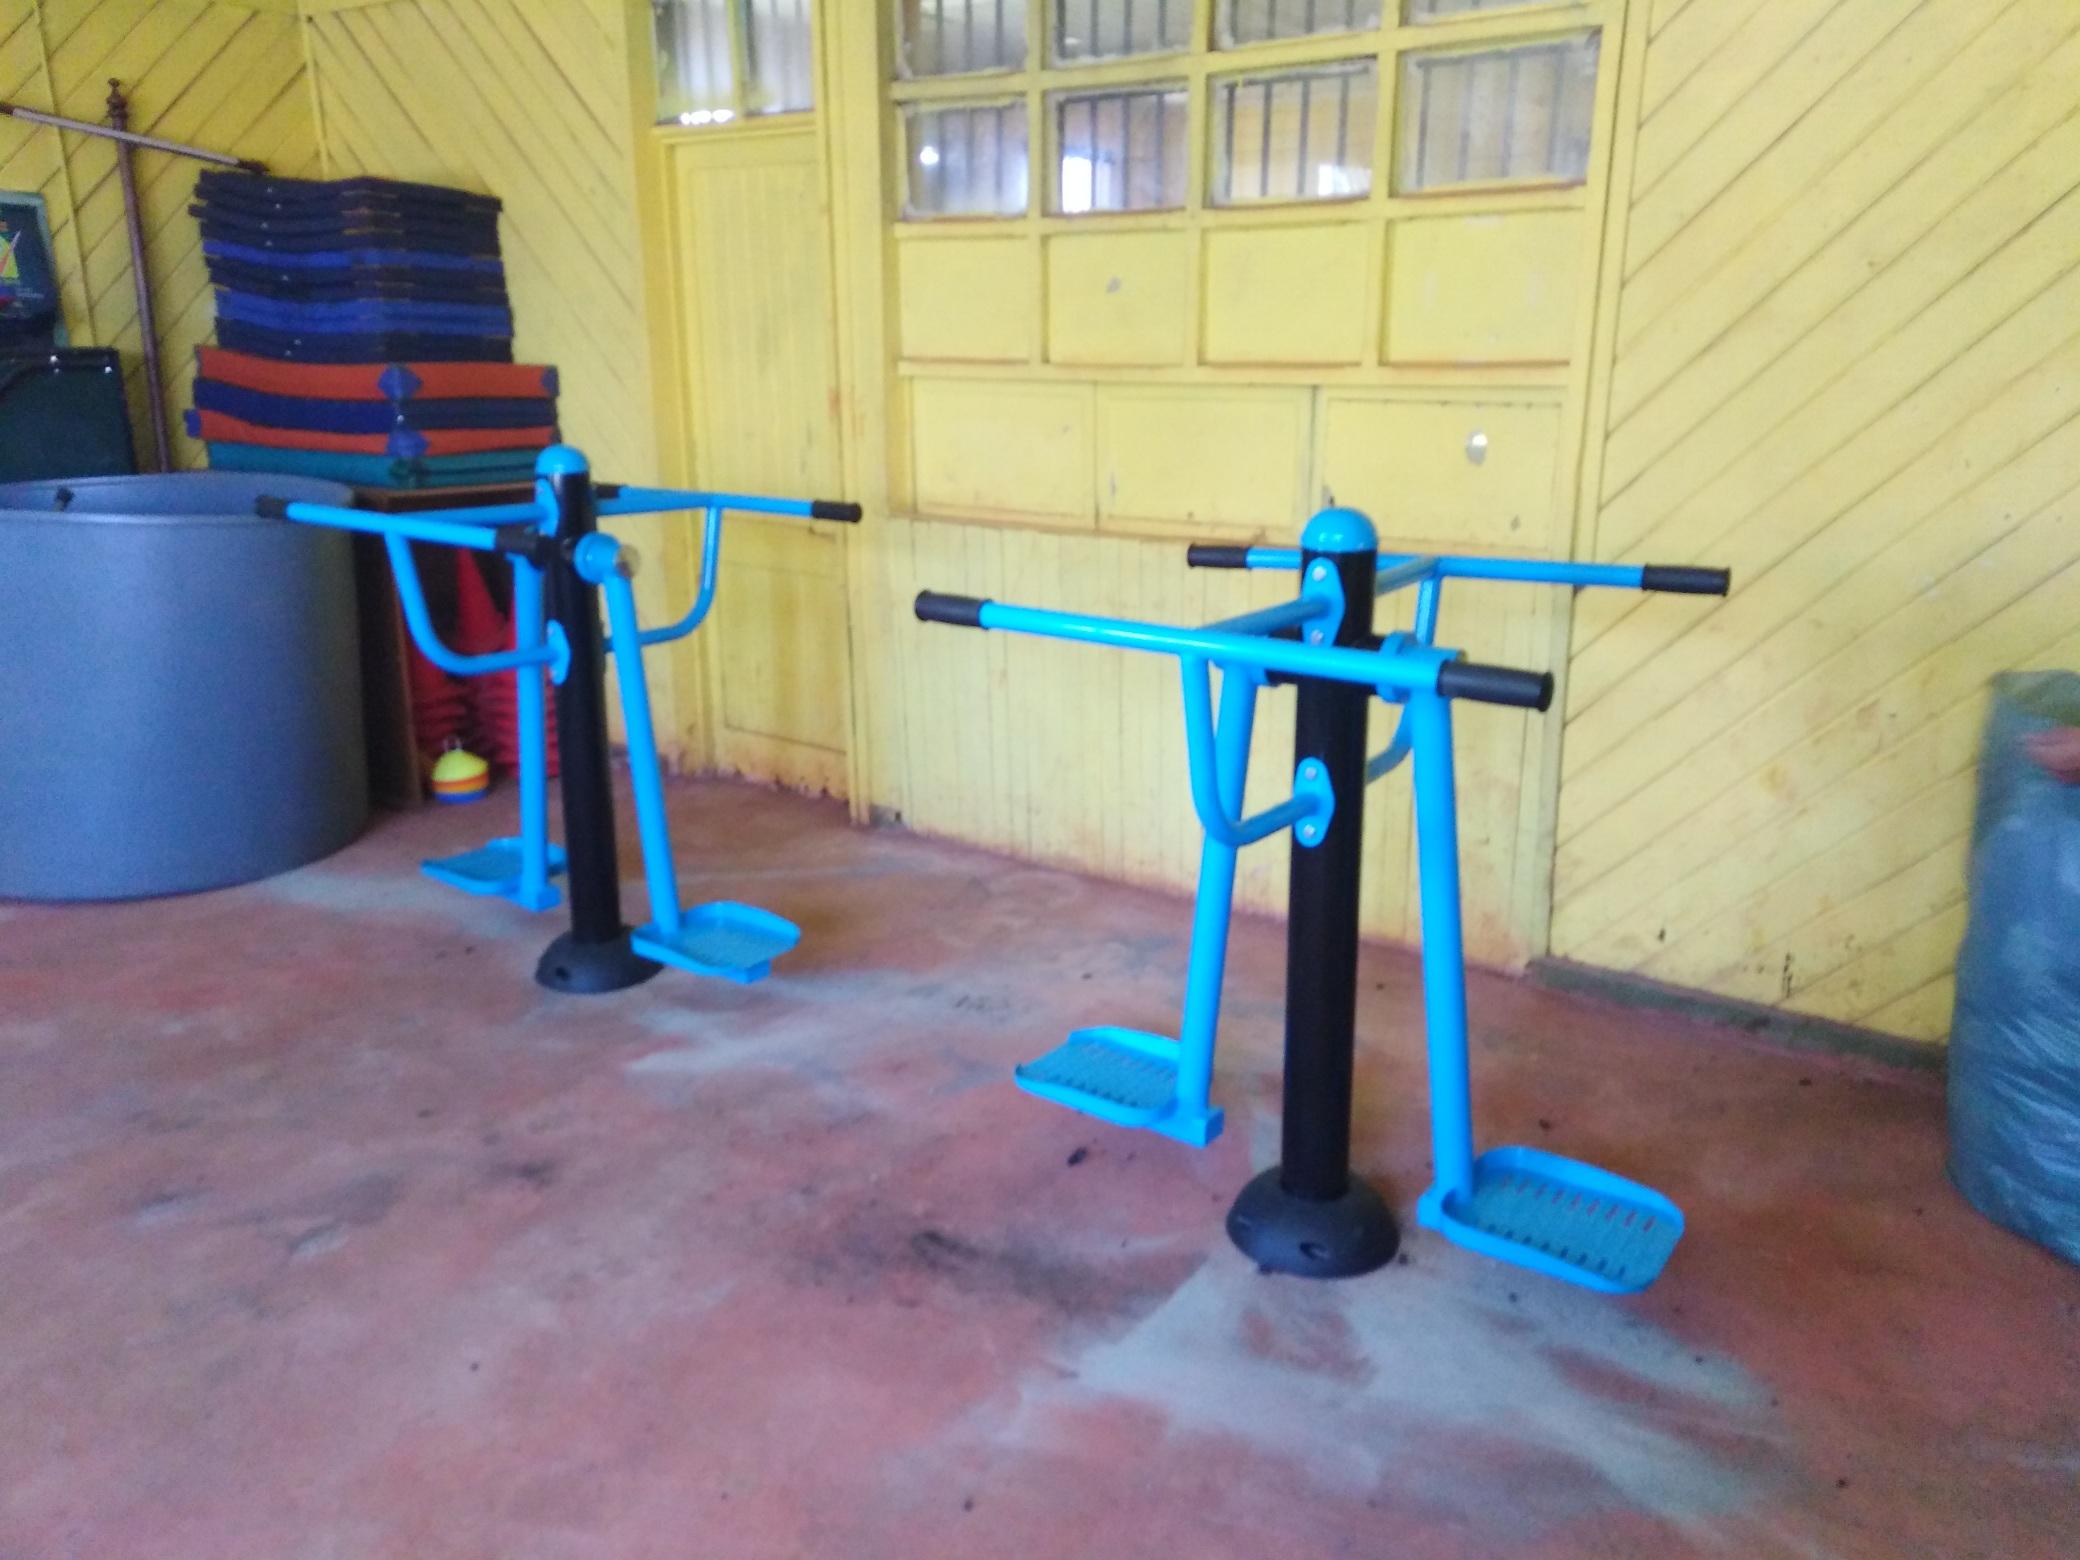 Maquina modeladora de cintura - comuna de Lautaro